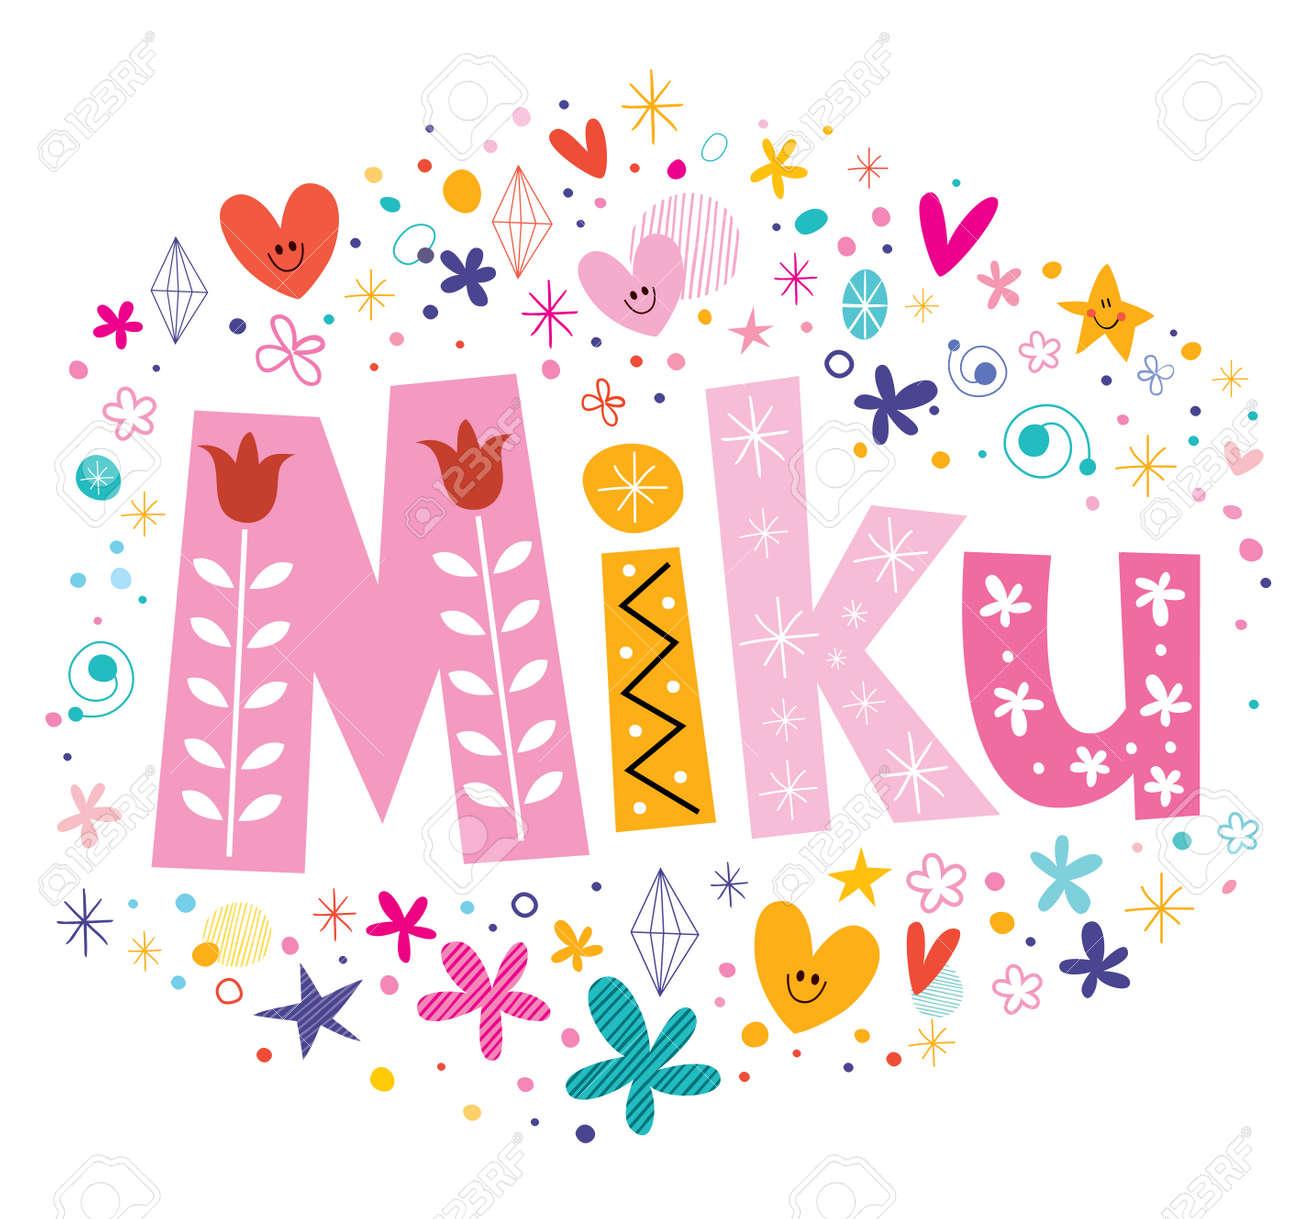 Miku - Japanese female given name